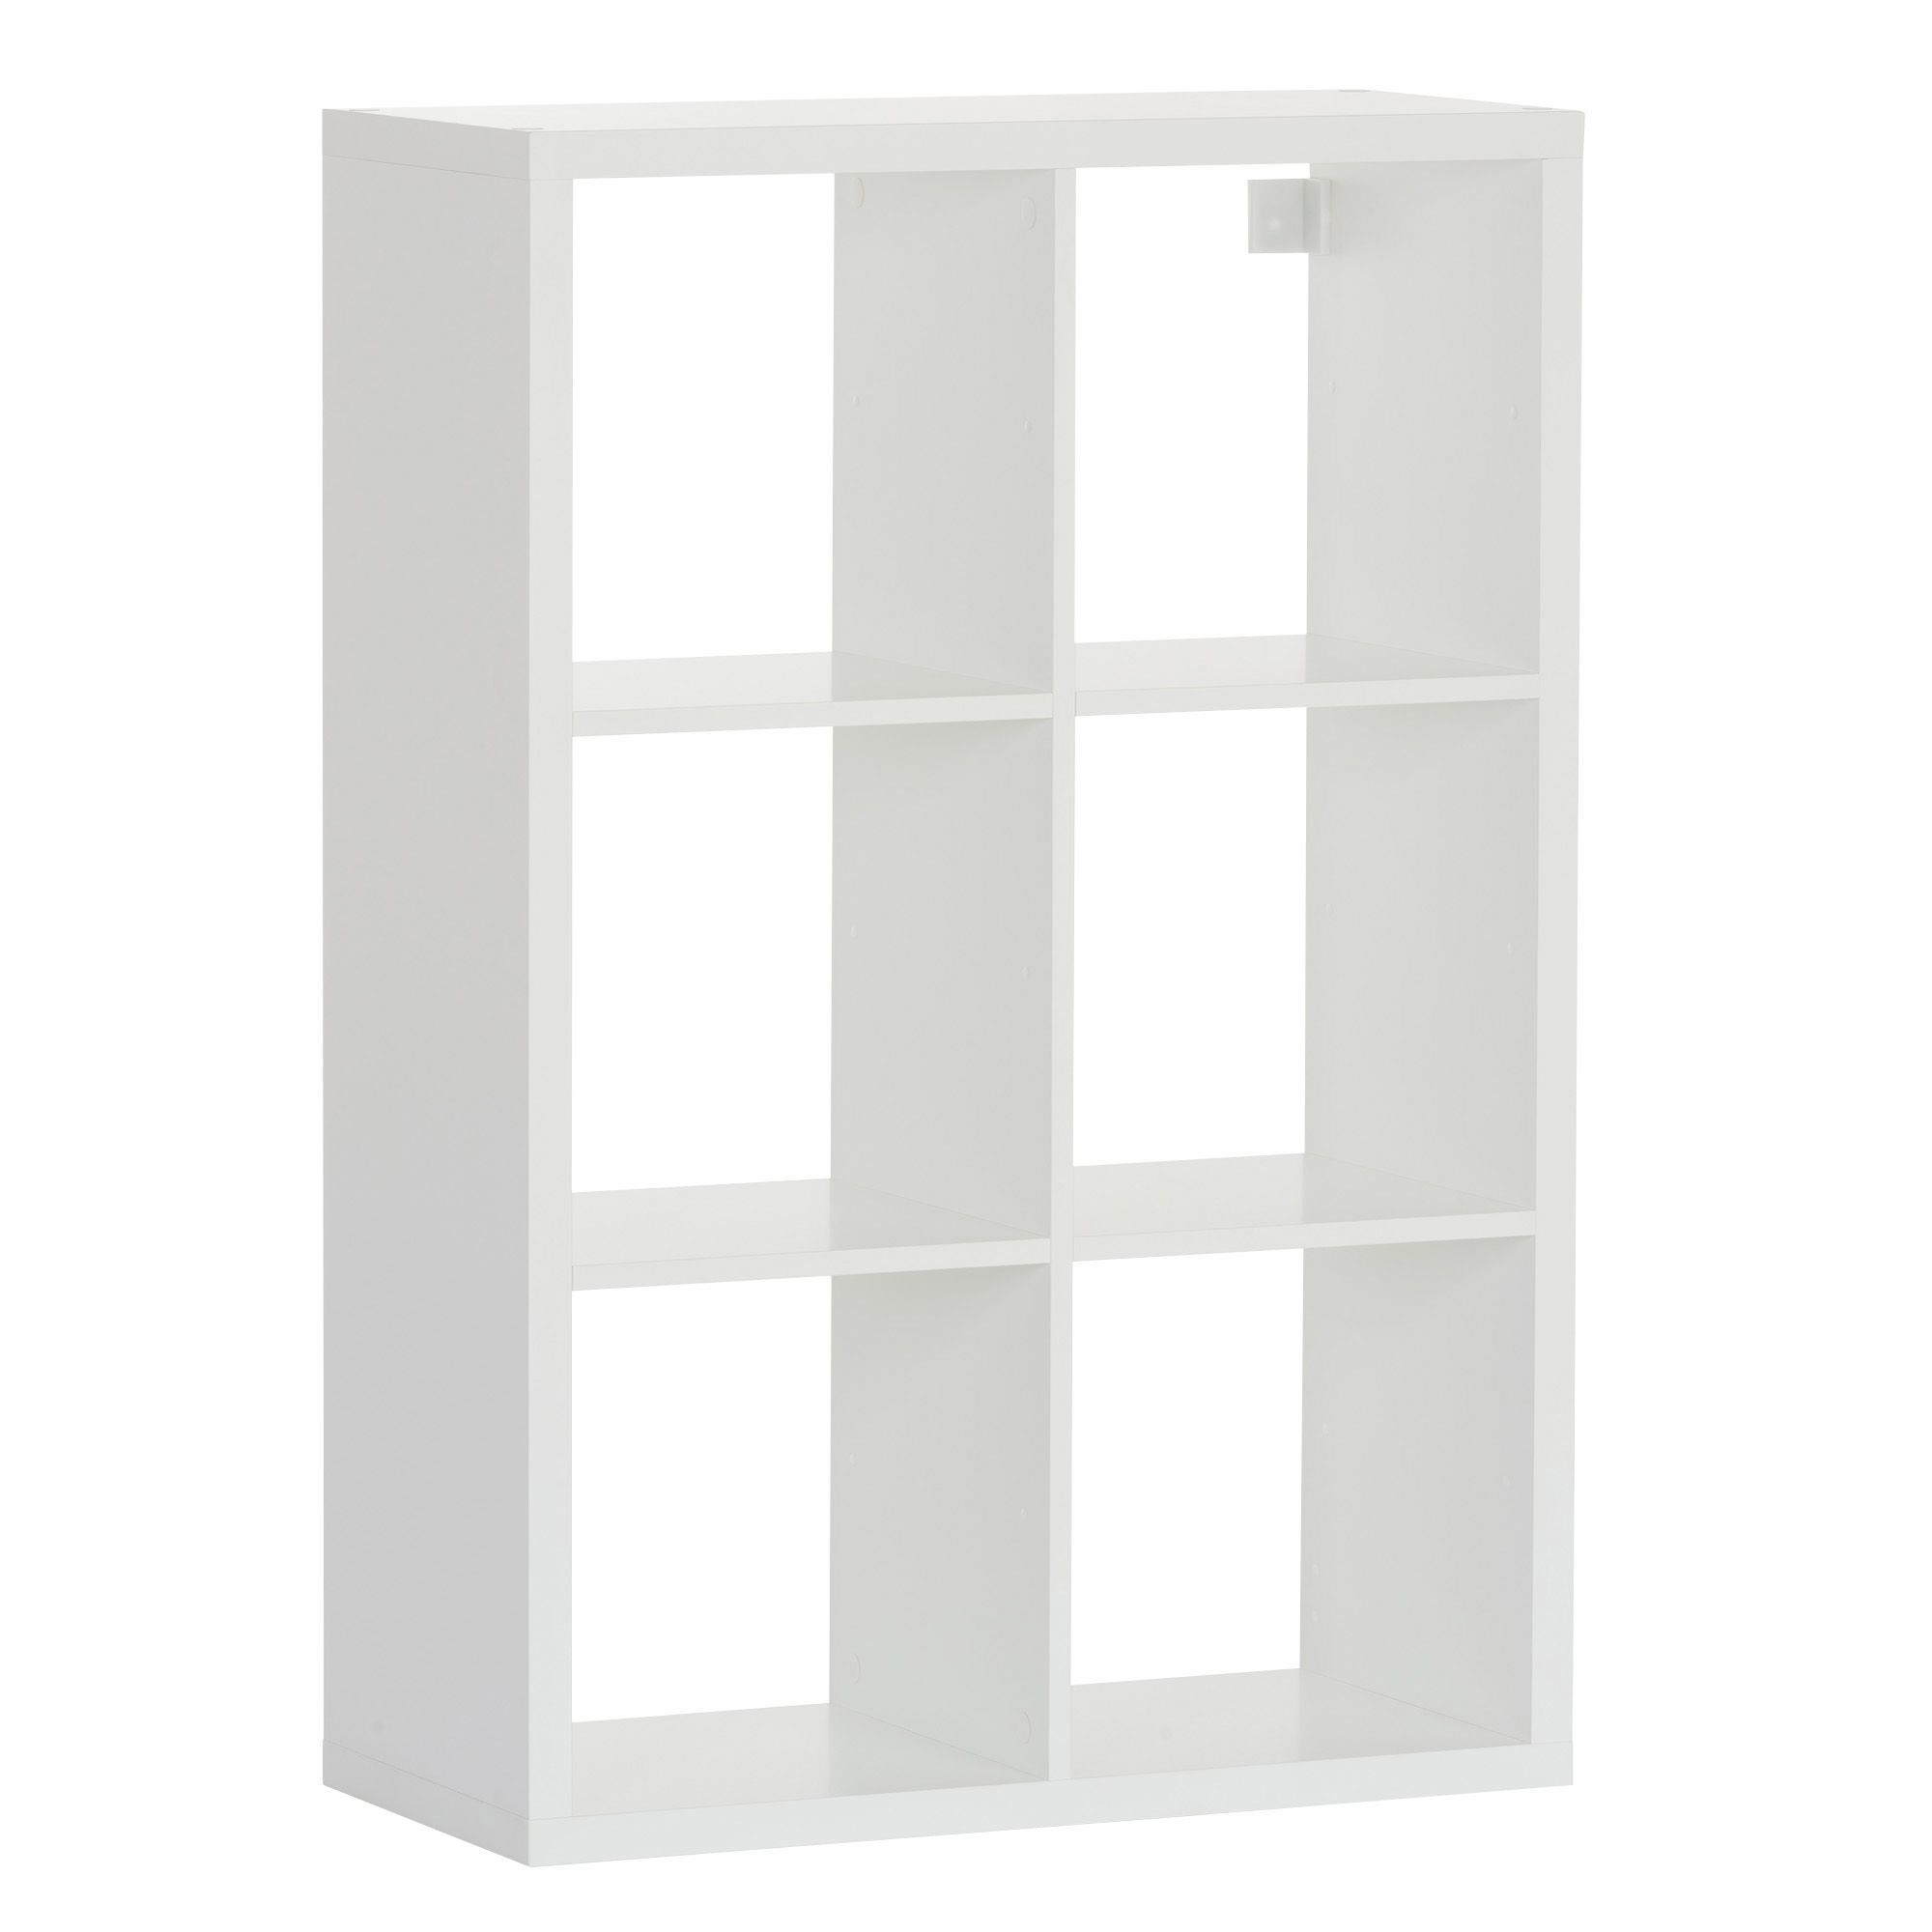 Form Miit White Cube Shelving L 737mm D 330mm Rooms